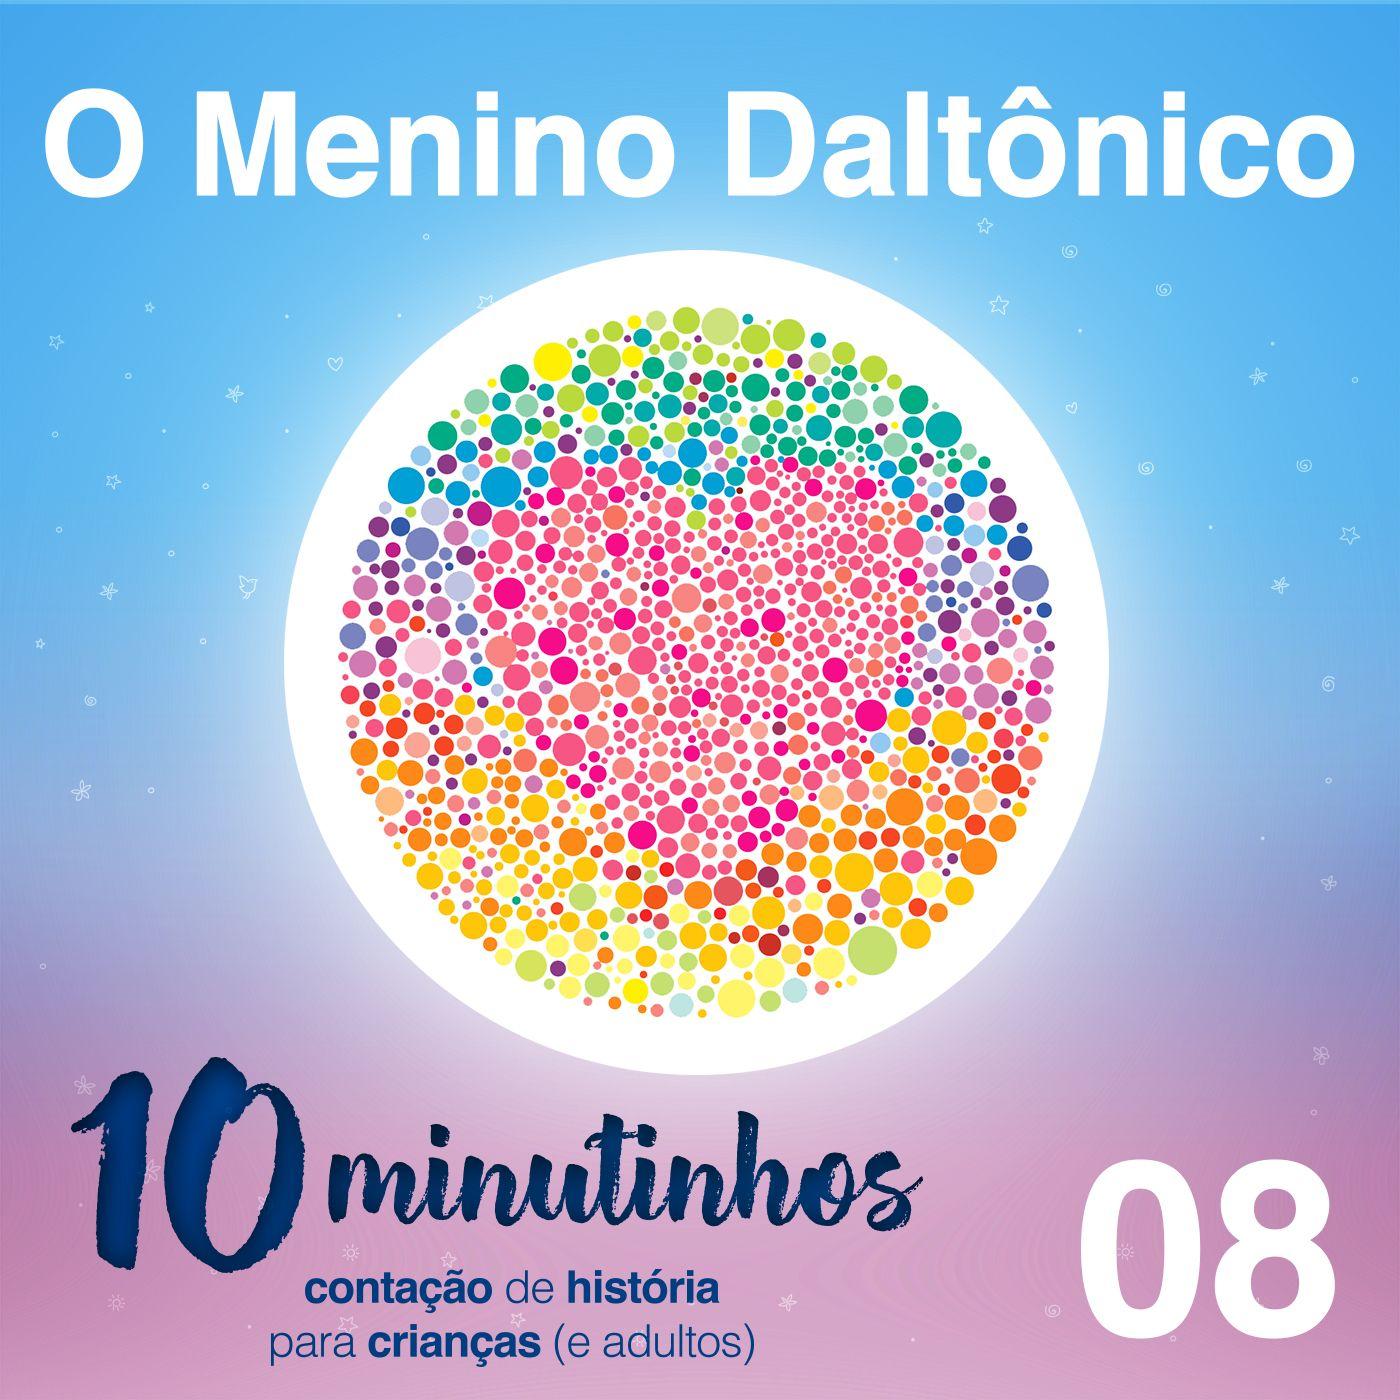 10 Minutinhos #08 - O Menino Daltônico